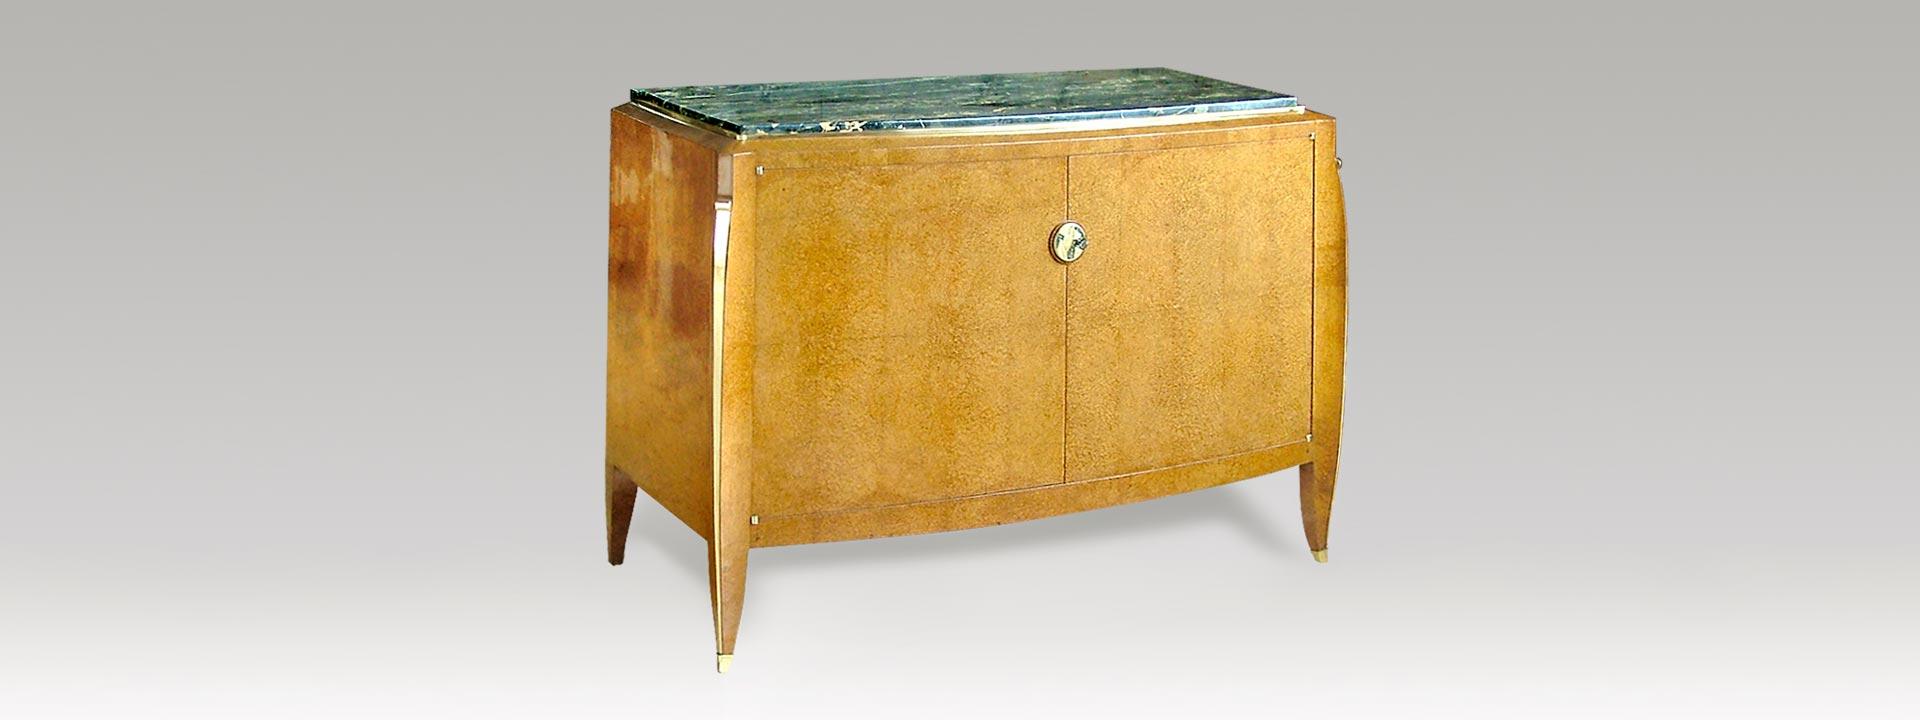 Restaurateur b niste de meubles ruhlmann du xxe si cle for Mobilier bureau yves ollivier